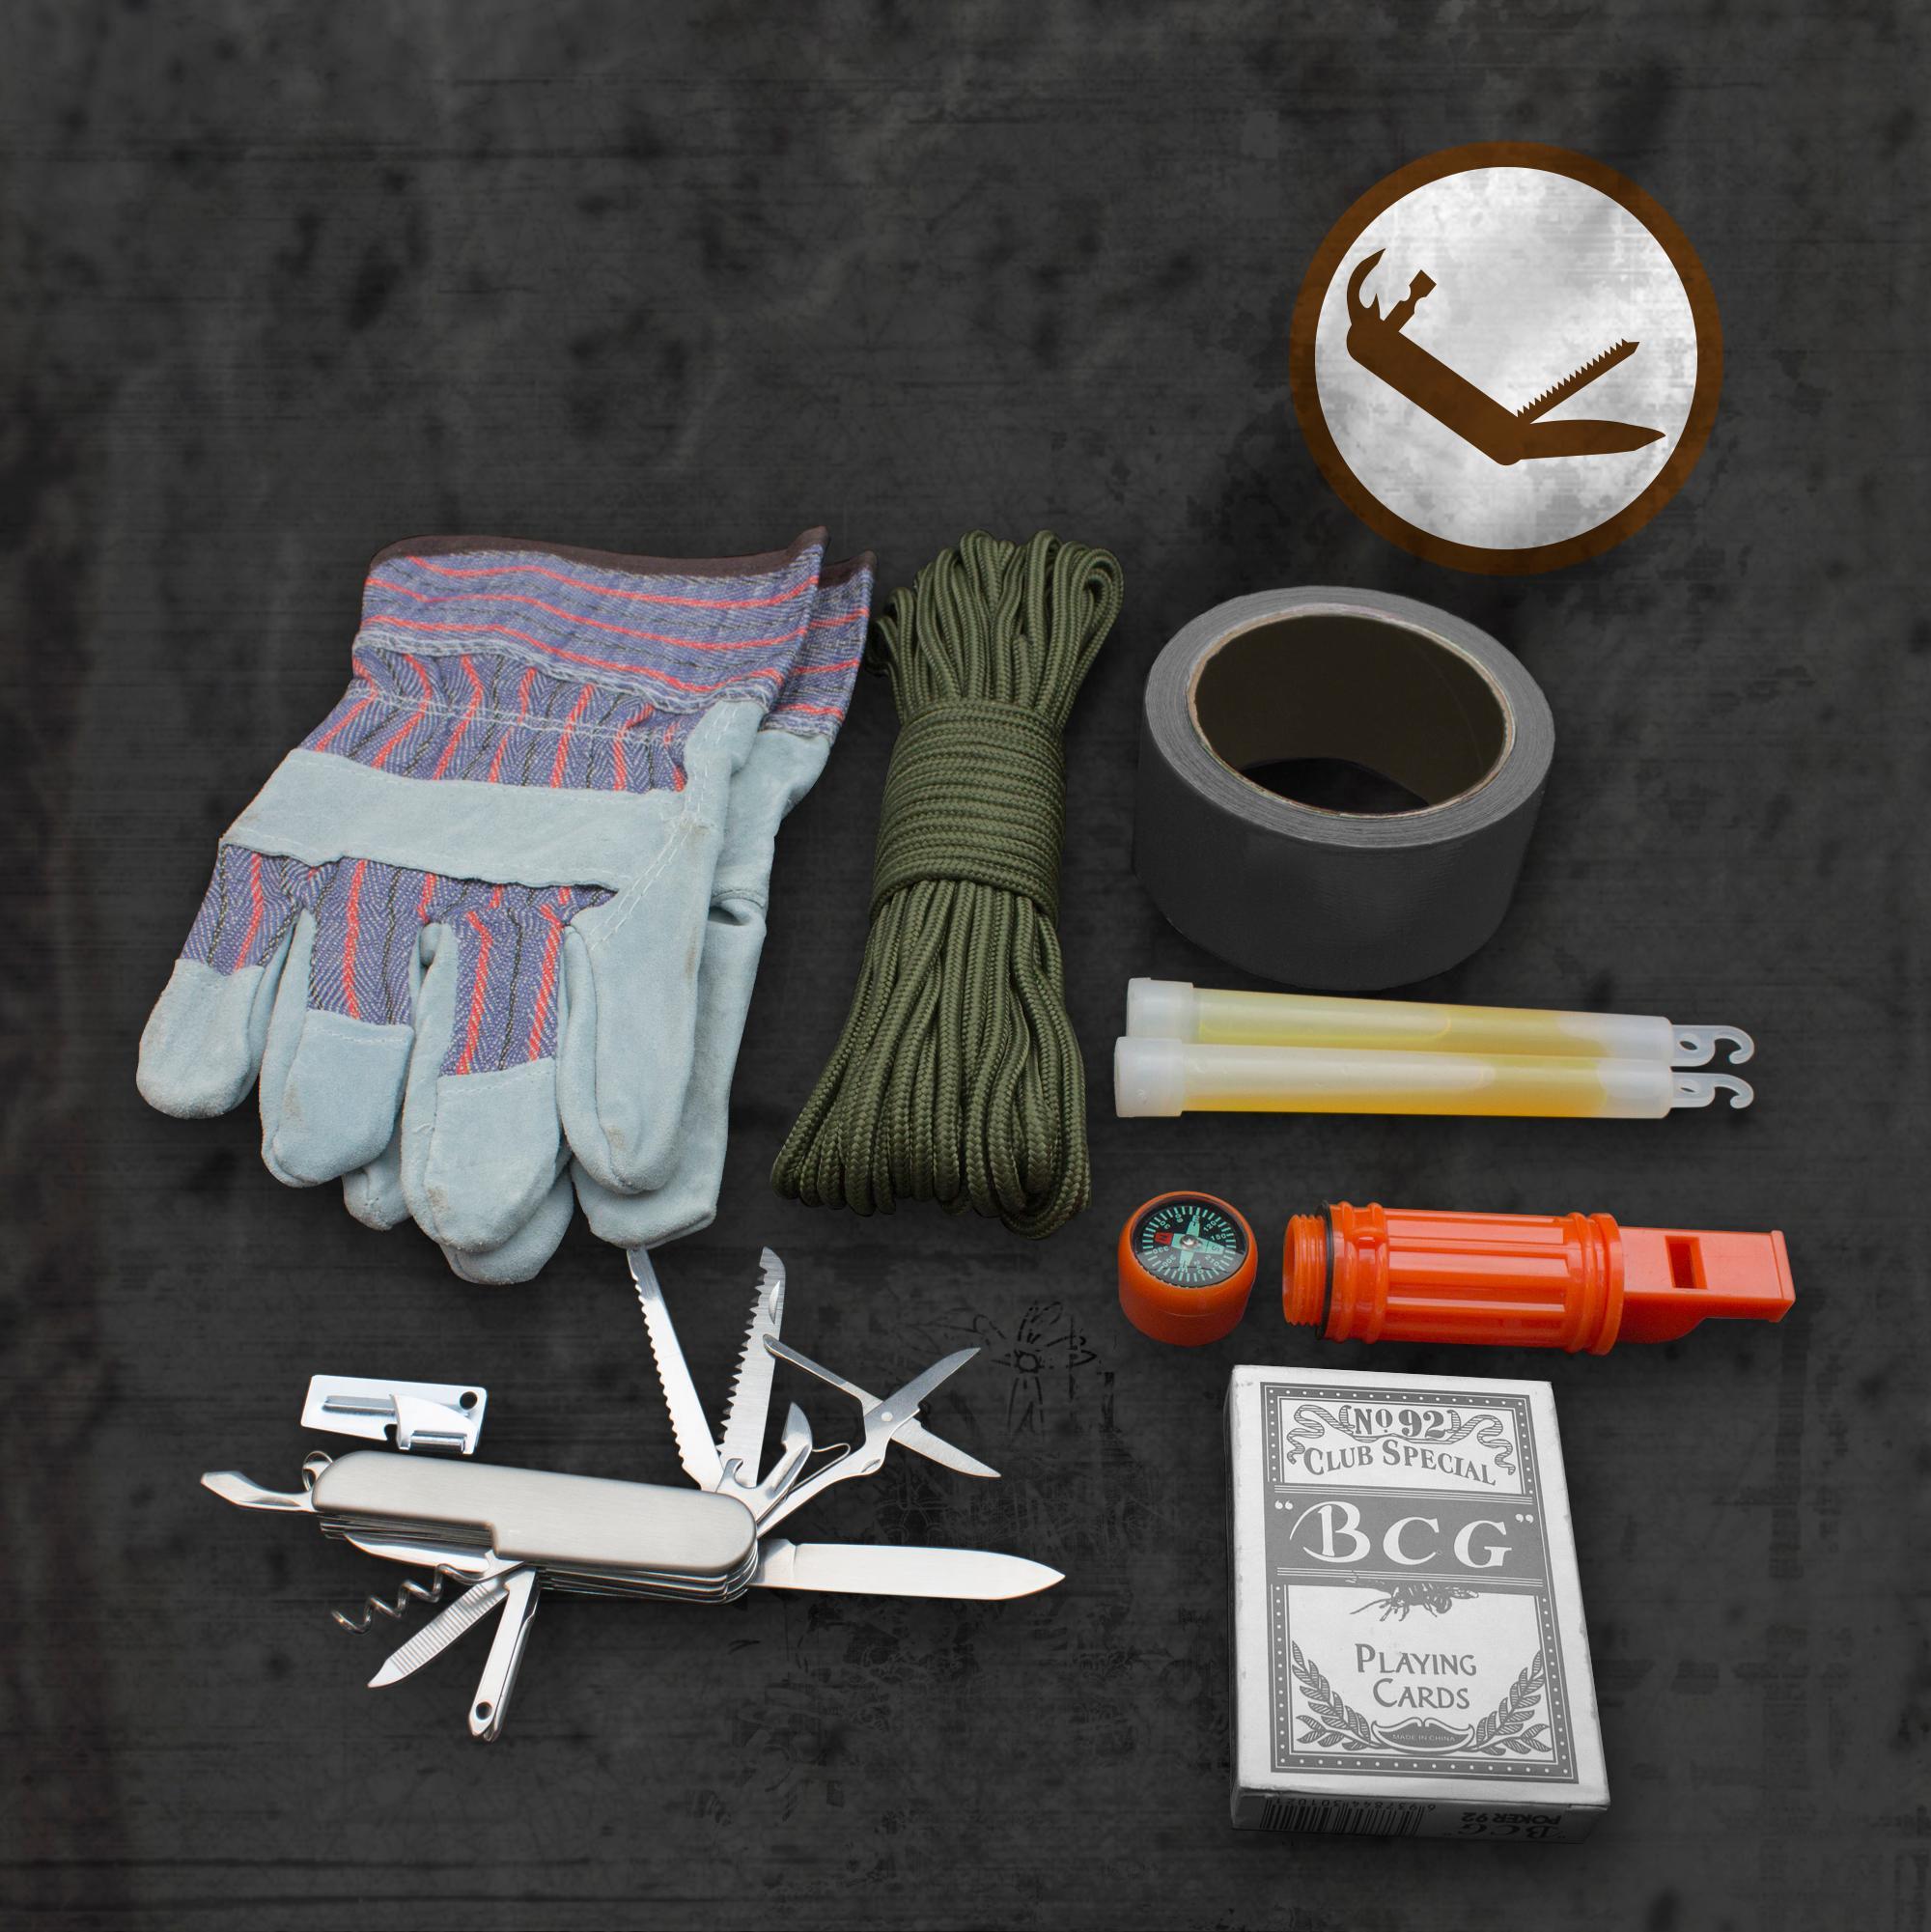 Shtf Emergency Preparedness: Emergency Zone 840-2 Urban Survival Bug Out Bag Emergency